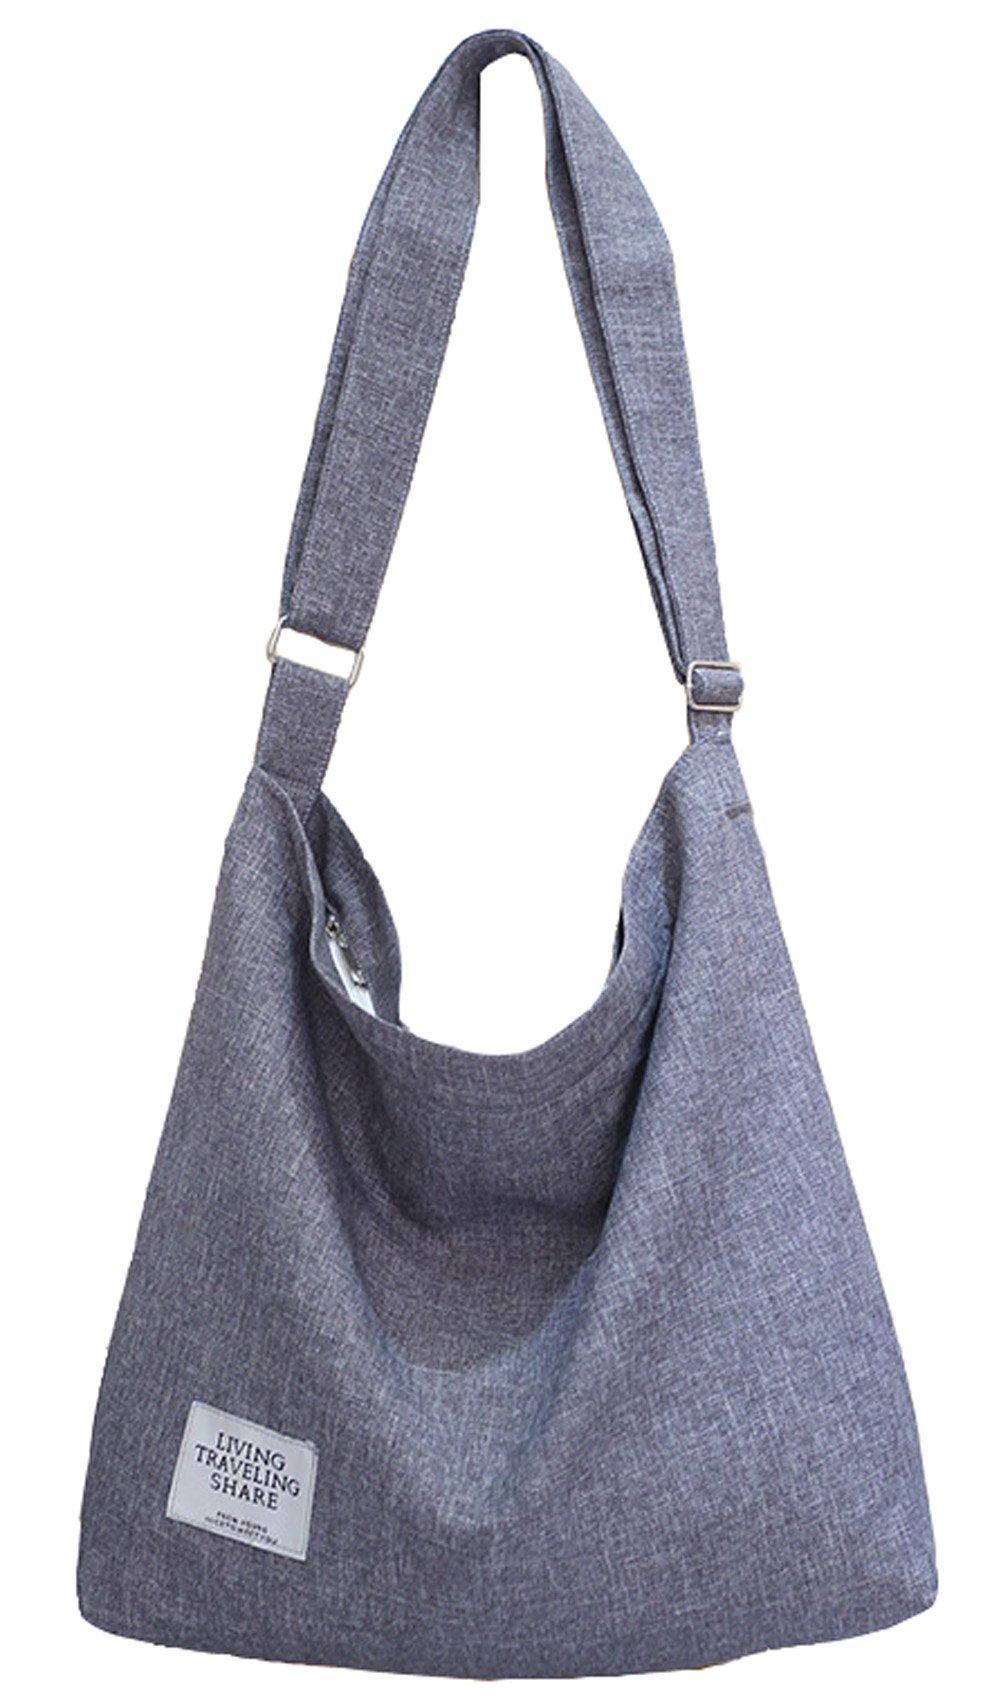 Covelin Women's Retro Large Size Canvas Shoulder Bag Hobo Crossbody Handbag Casual Tote Light Grey by Covelin